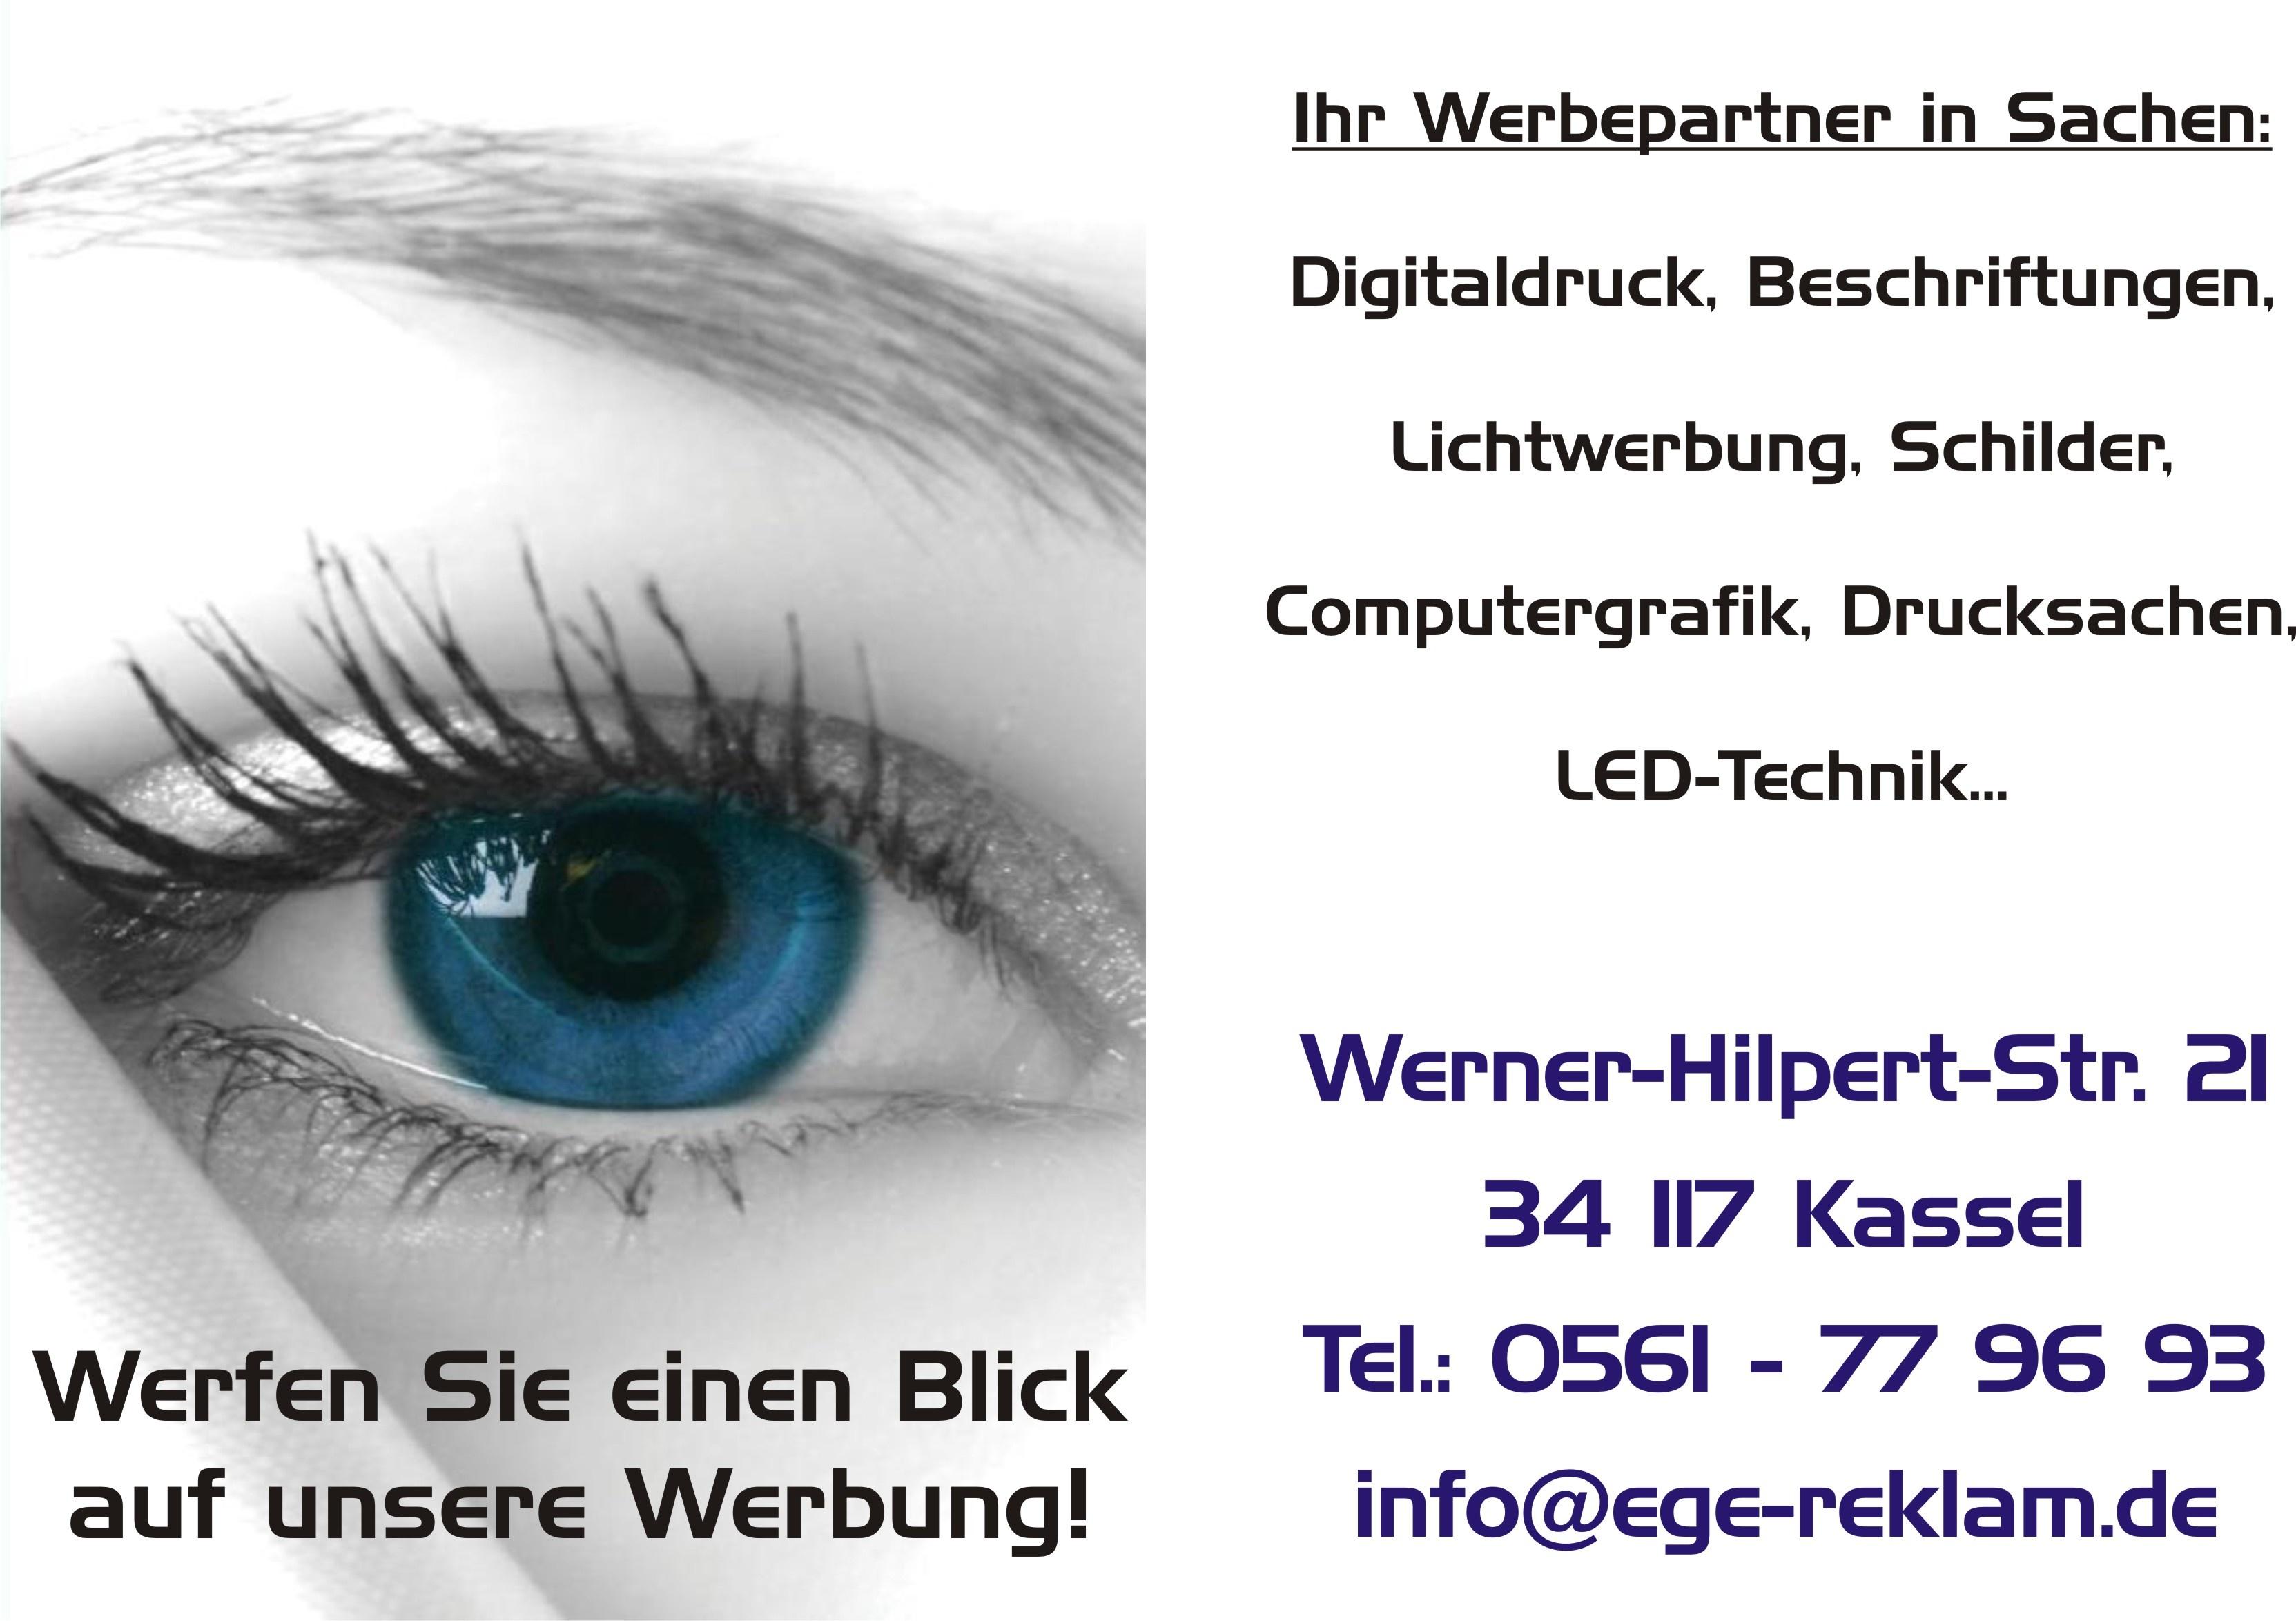 website-willkommen_3326